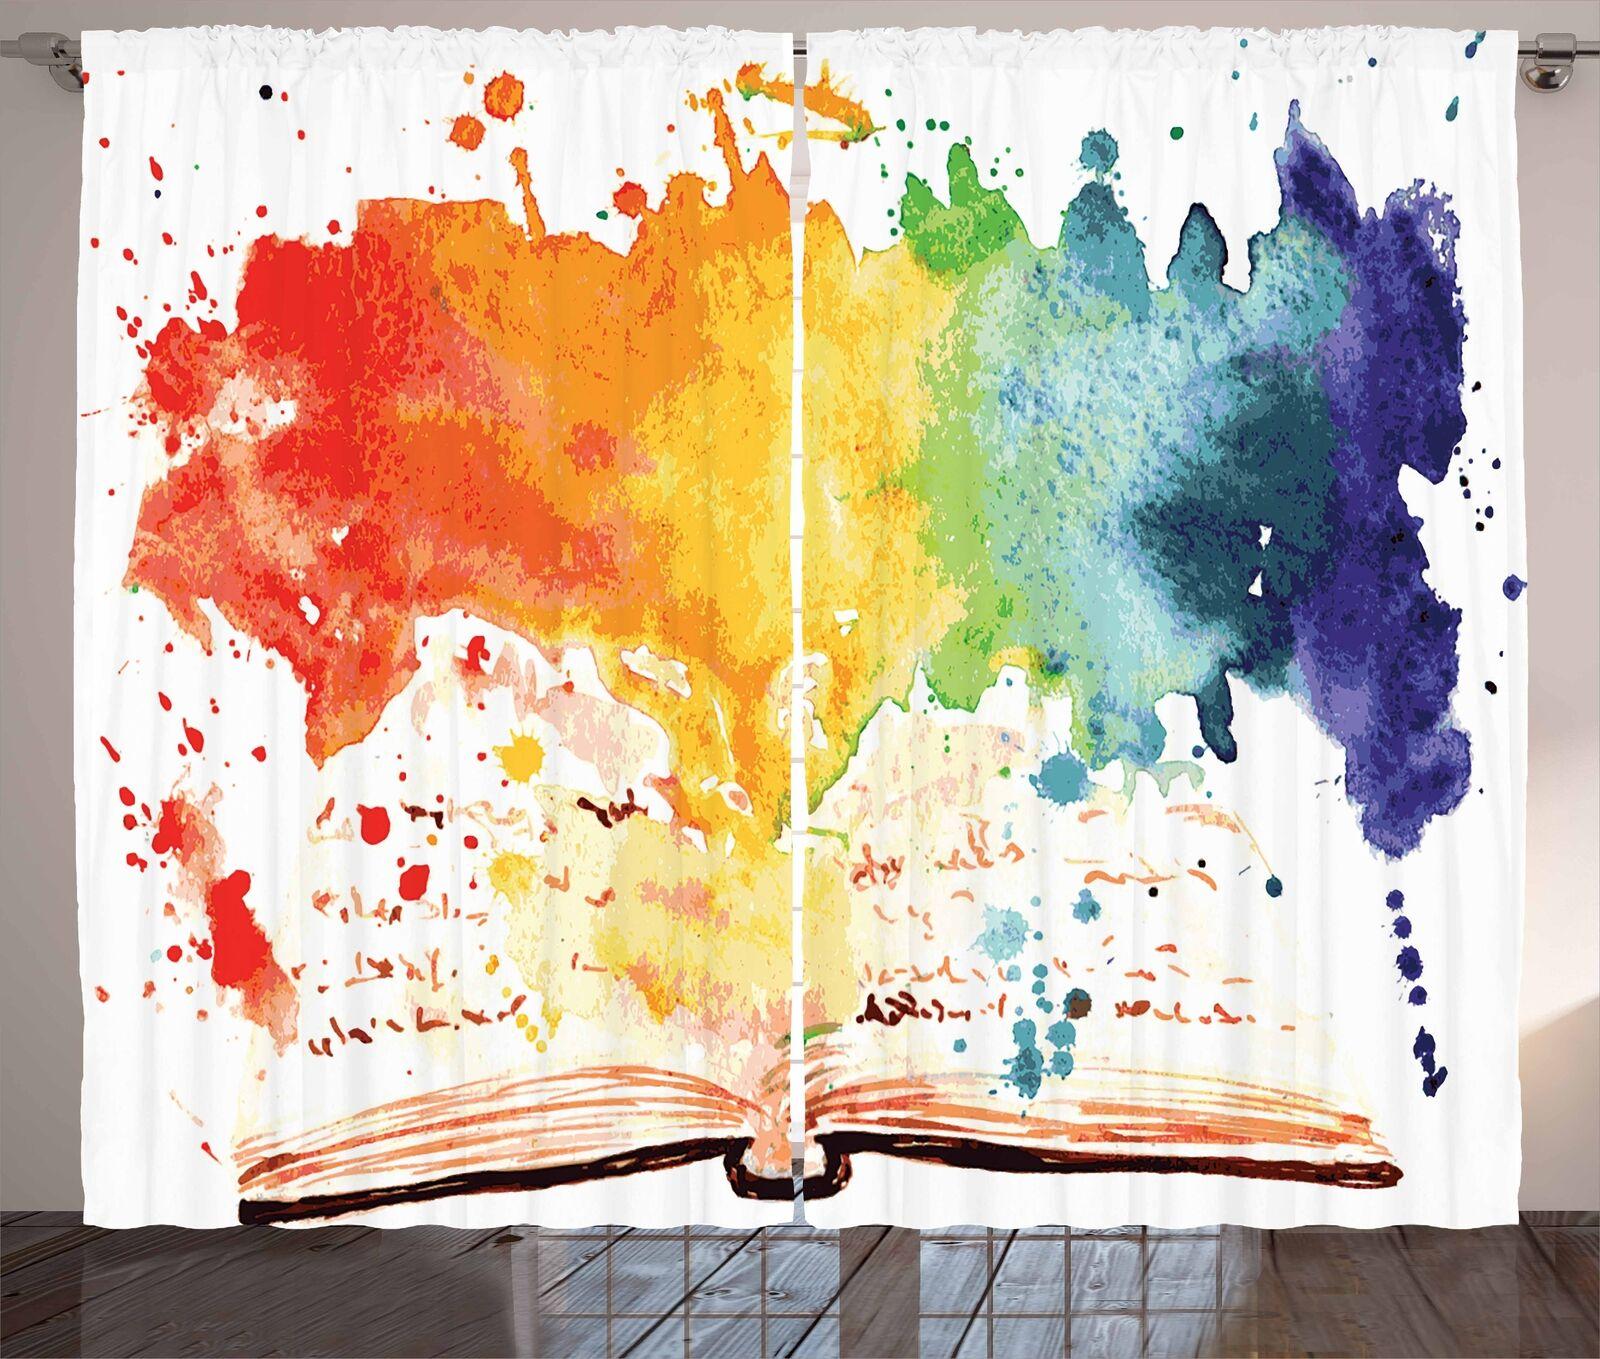 Cortinas De Acuarela Libro Abierto Colors ventana Cortinas 2 pulgadas Panel Set 108x84